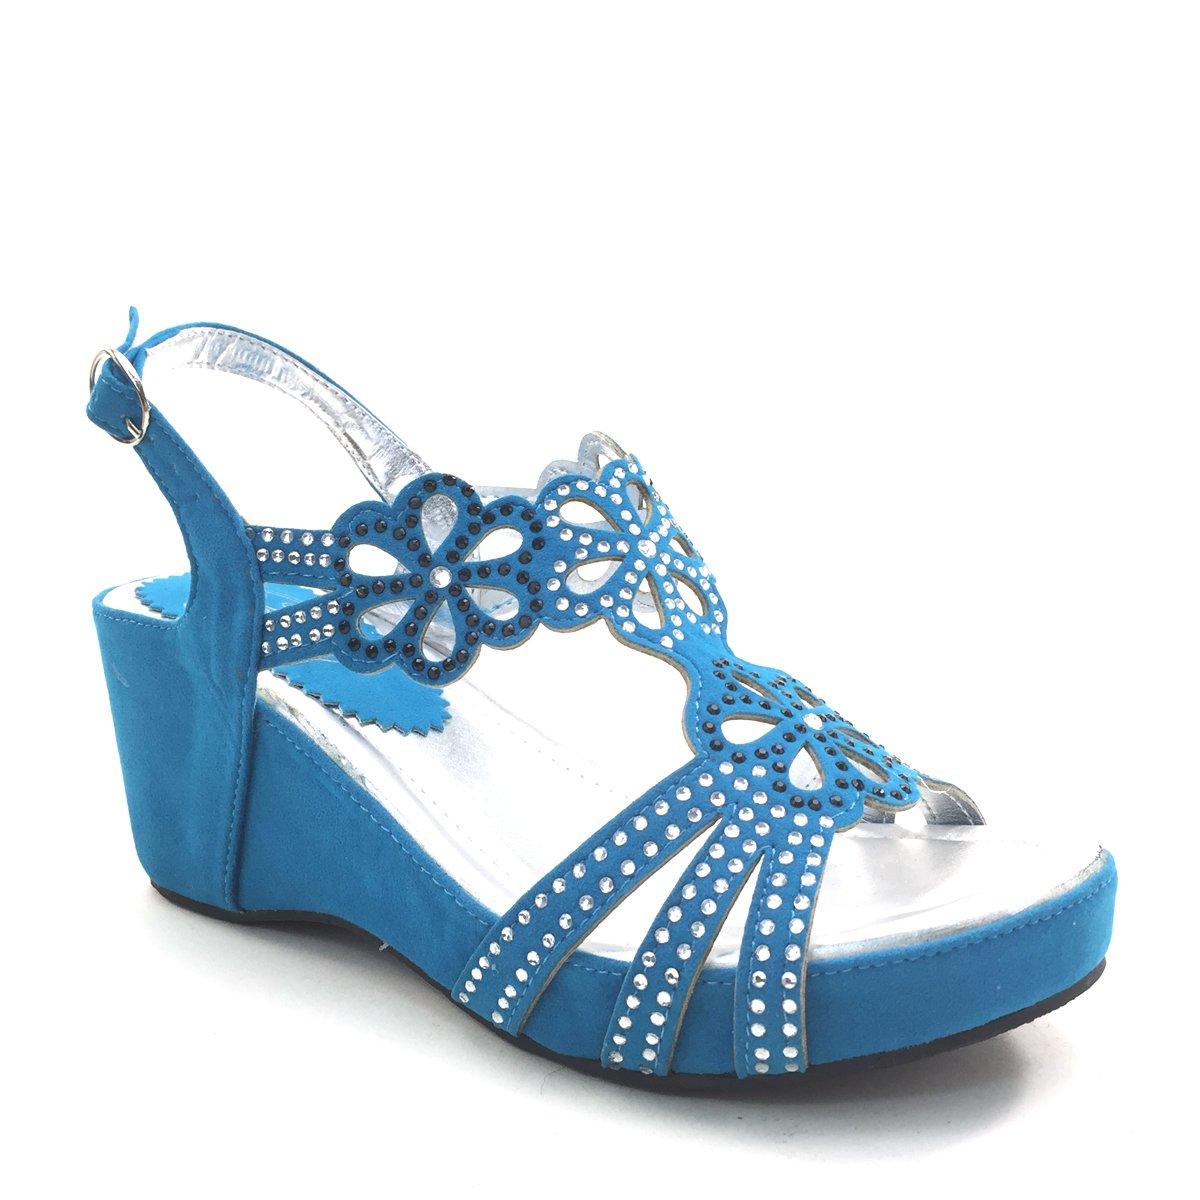 New Brieten Women's Rhinestone Flowers Strappy Wedge Platform Slingback Comfort Sandals B00IP6LMVC 5.5 B(M) US|Turquoise